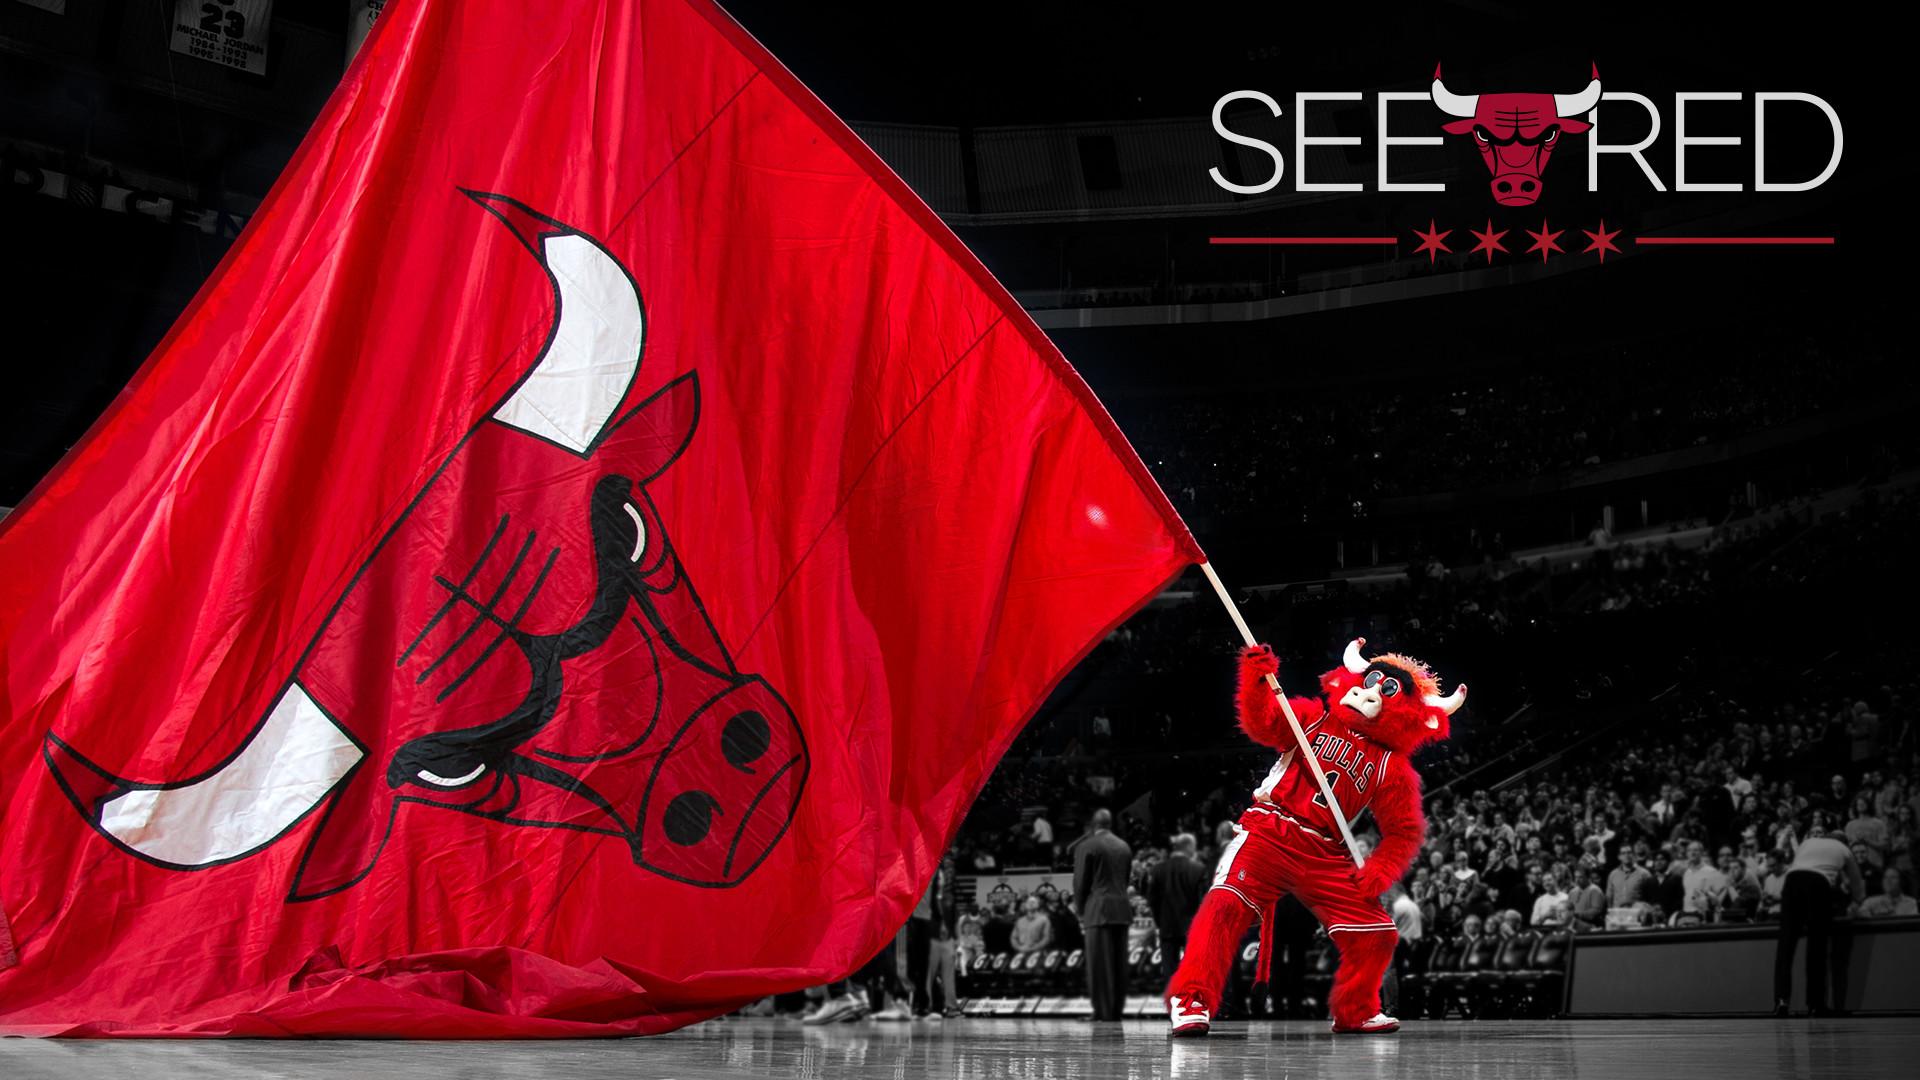 Chicago Bulls | 2014 NBA Playoffs | See Red